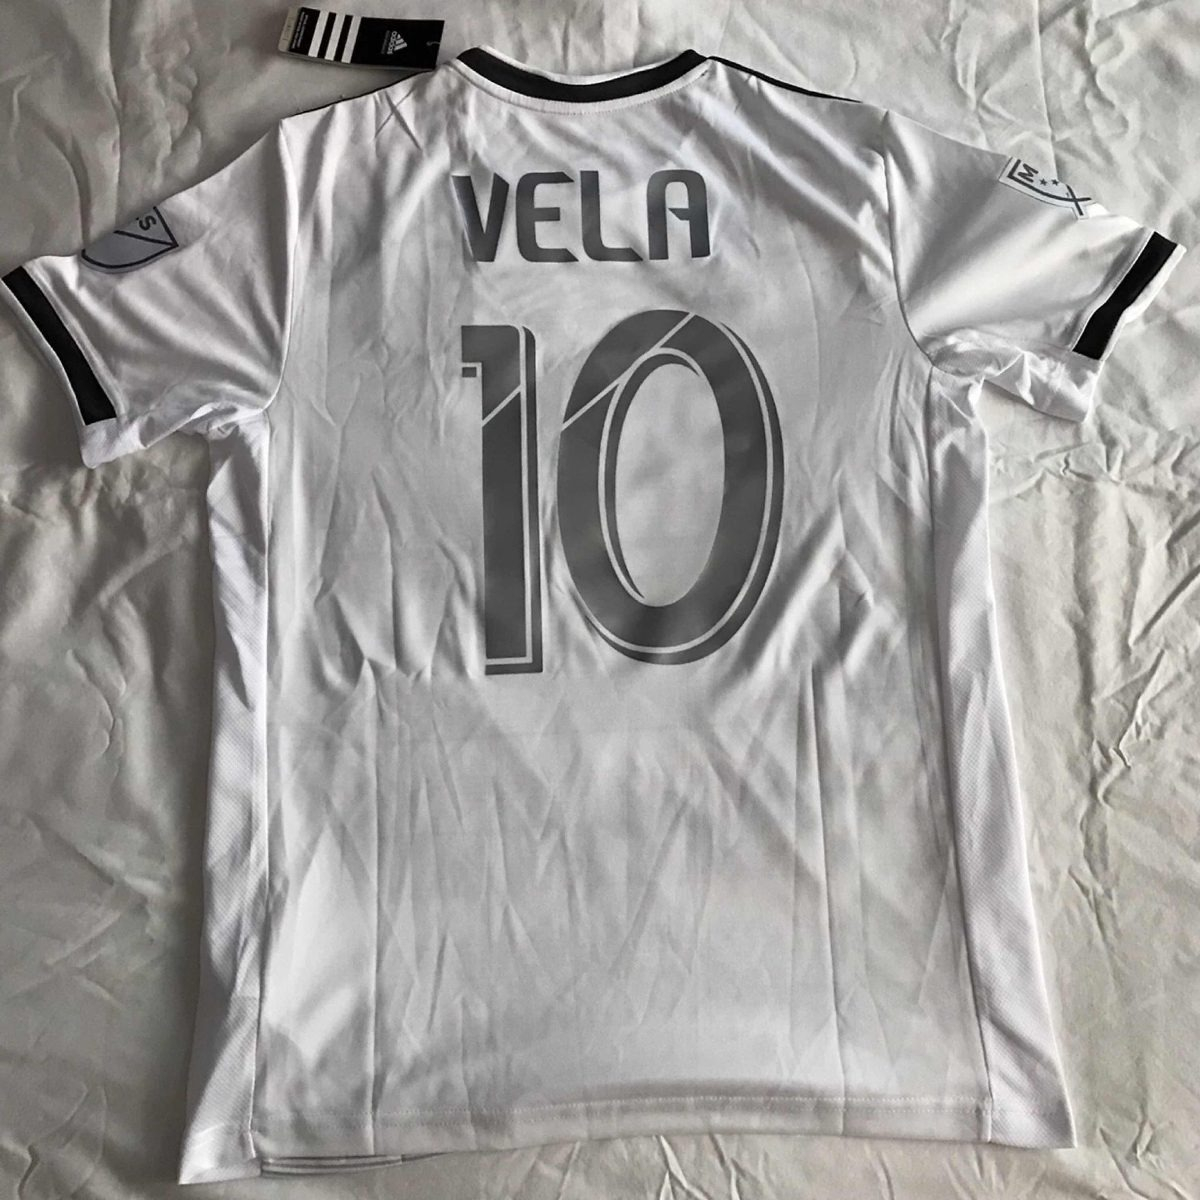 low priced 9eee7 c53a9 Jersey Playera Los Ángeles Fc Lafc Carlos Vela #10